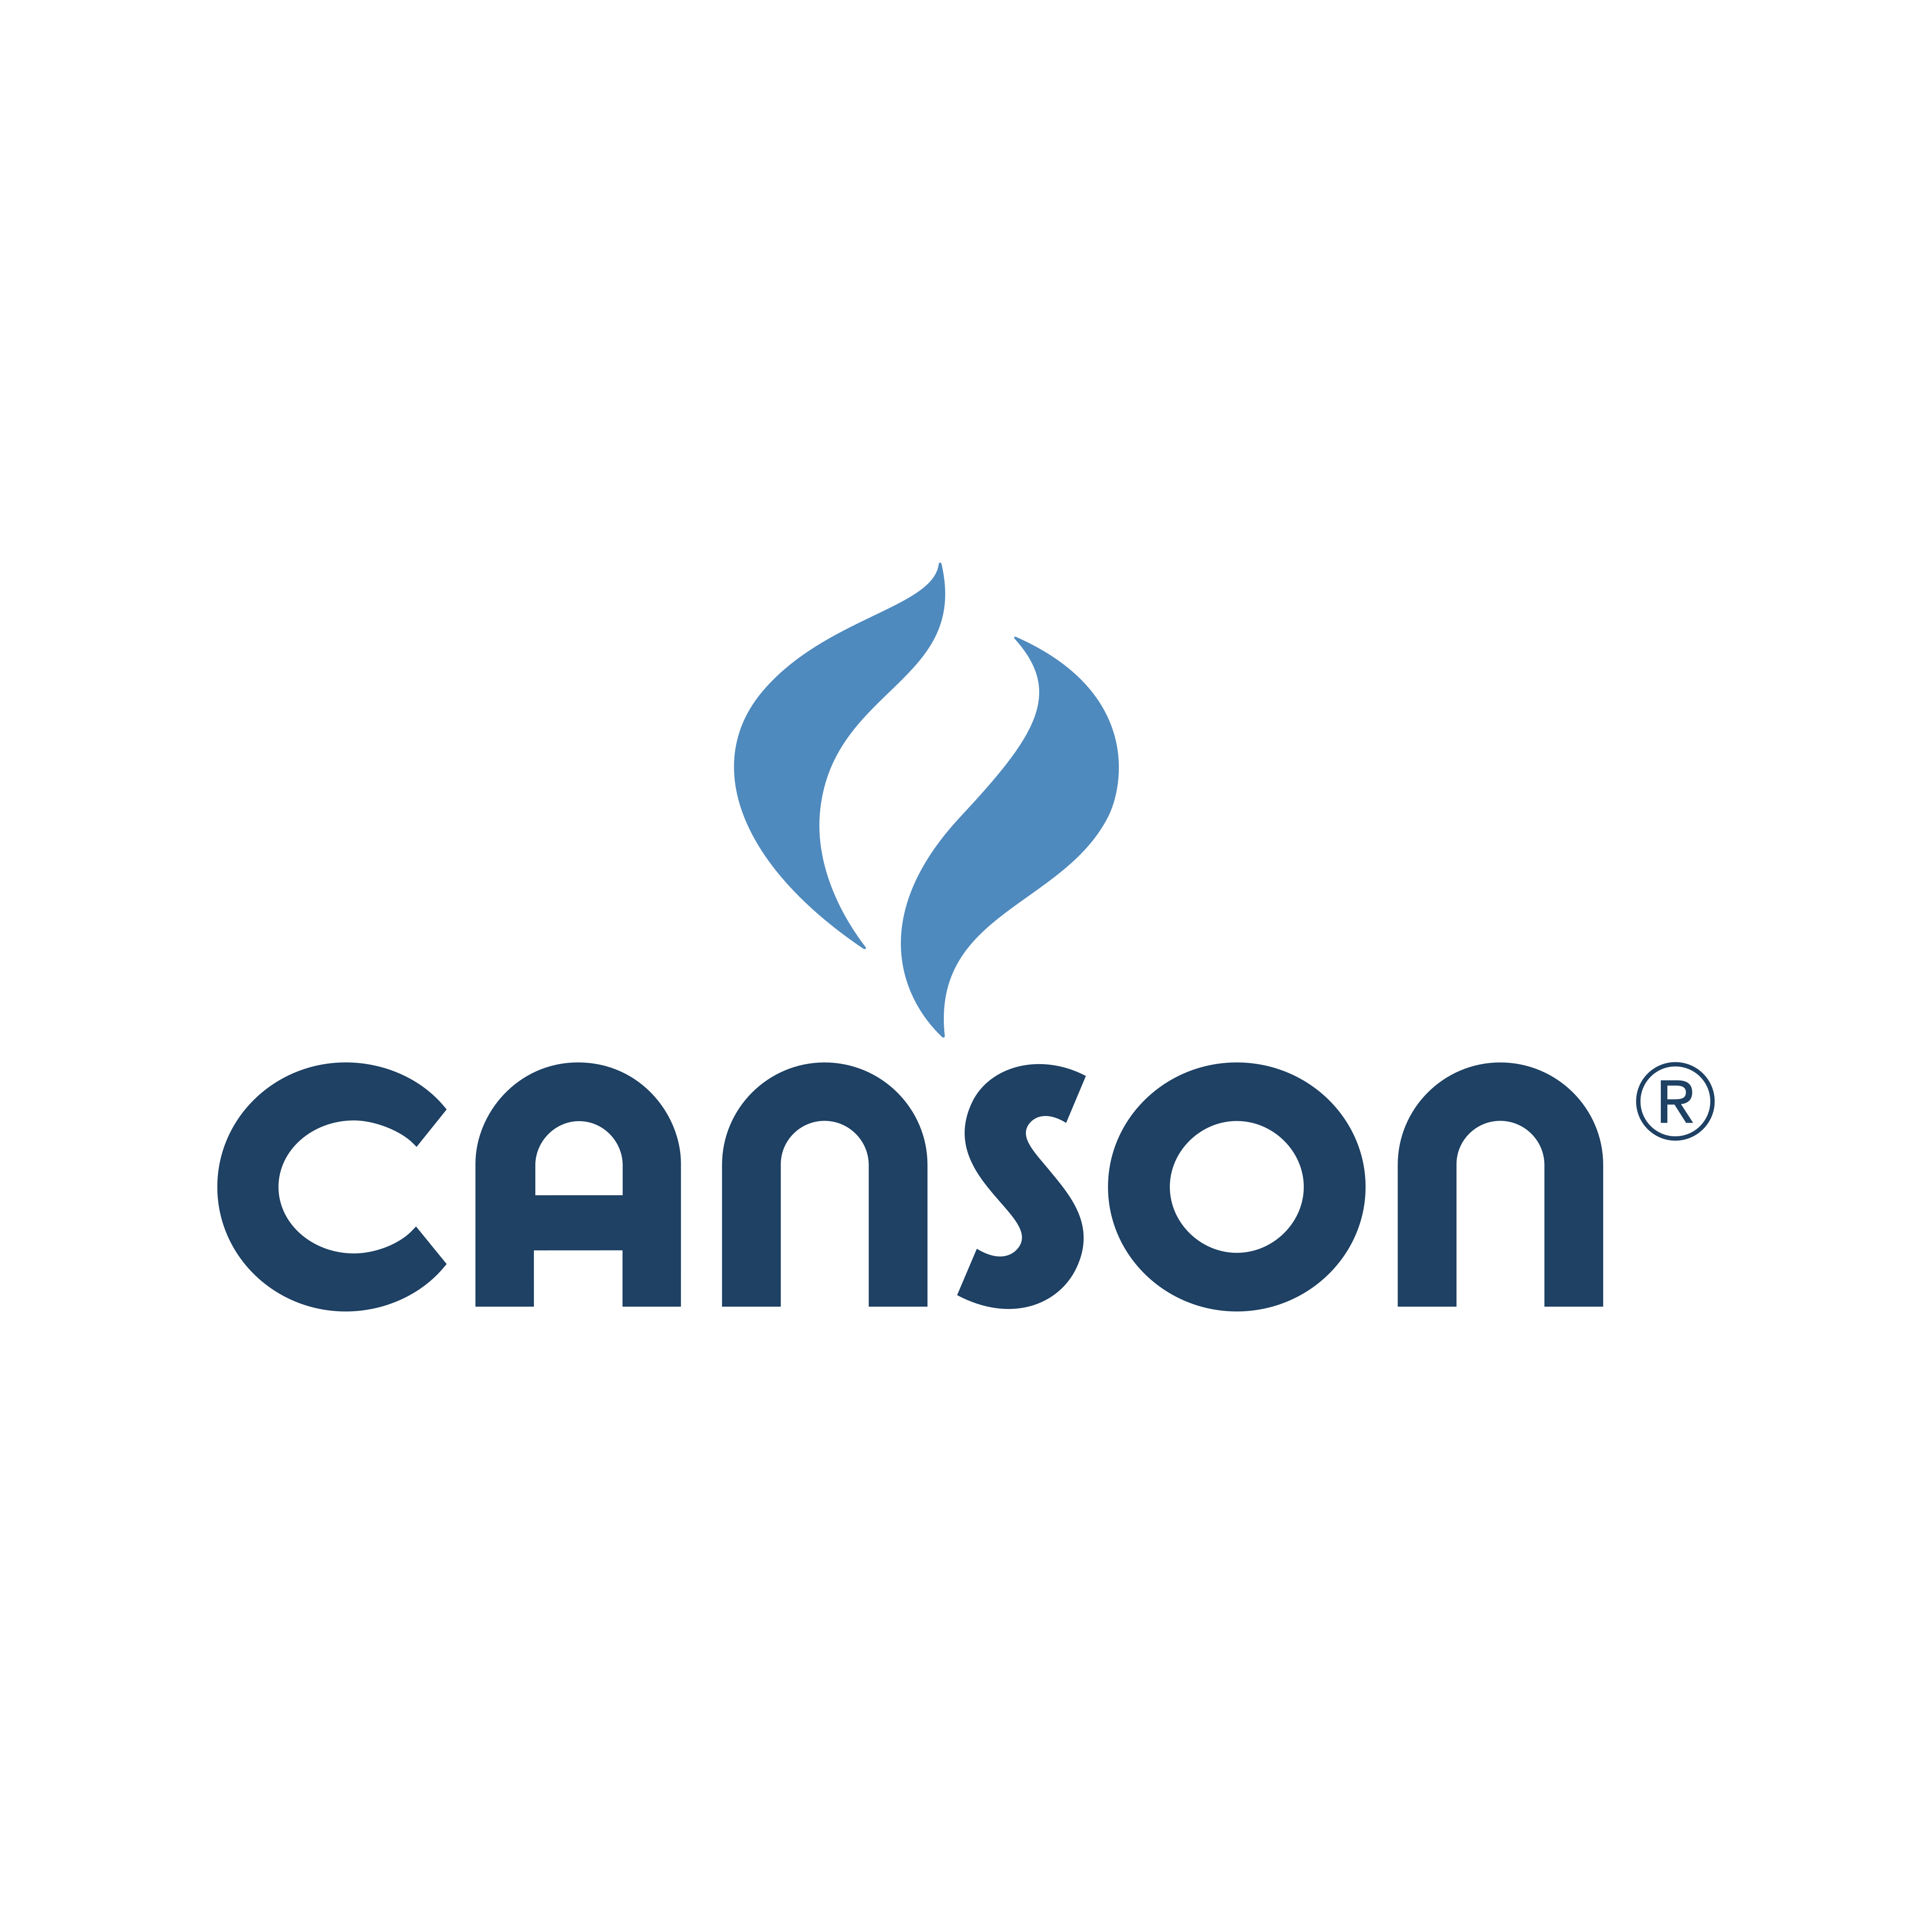 canson logo 0 - Canson Logo